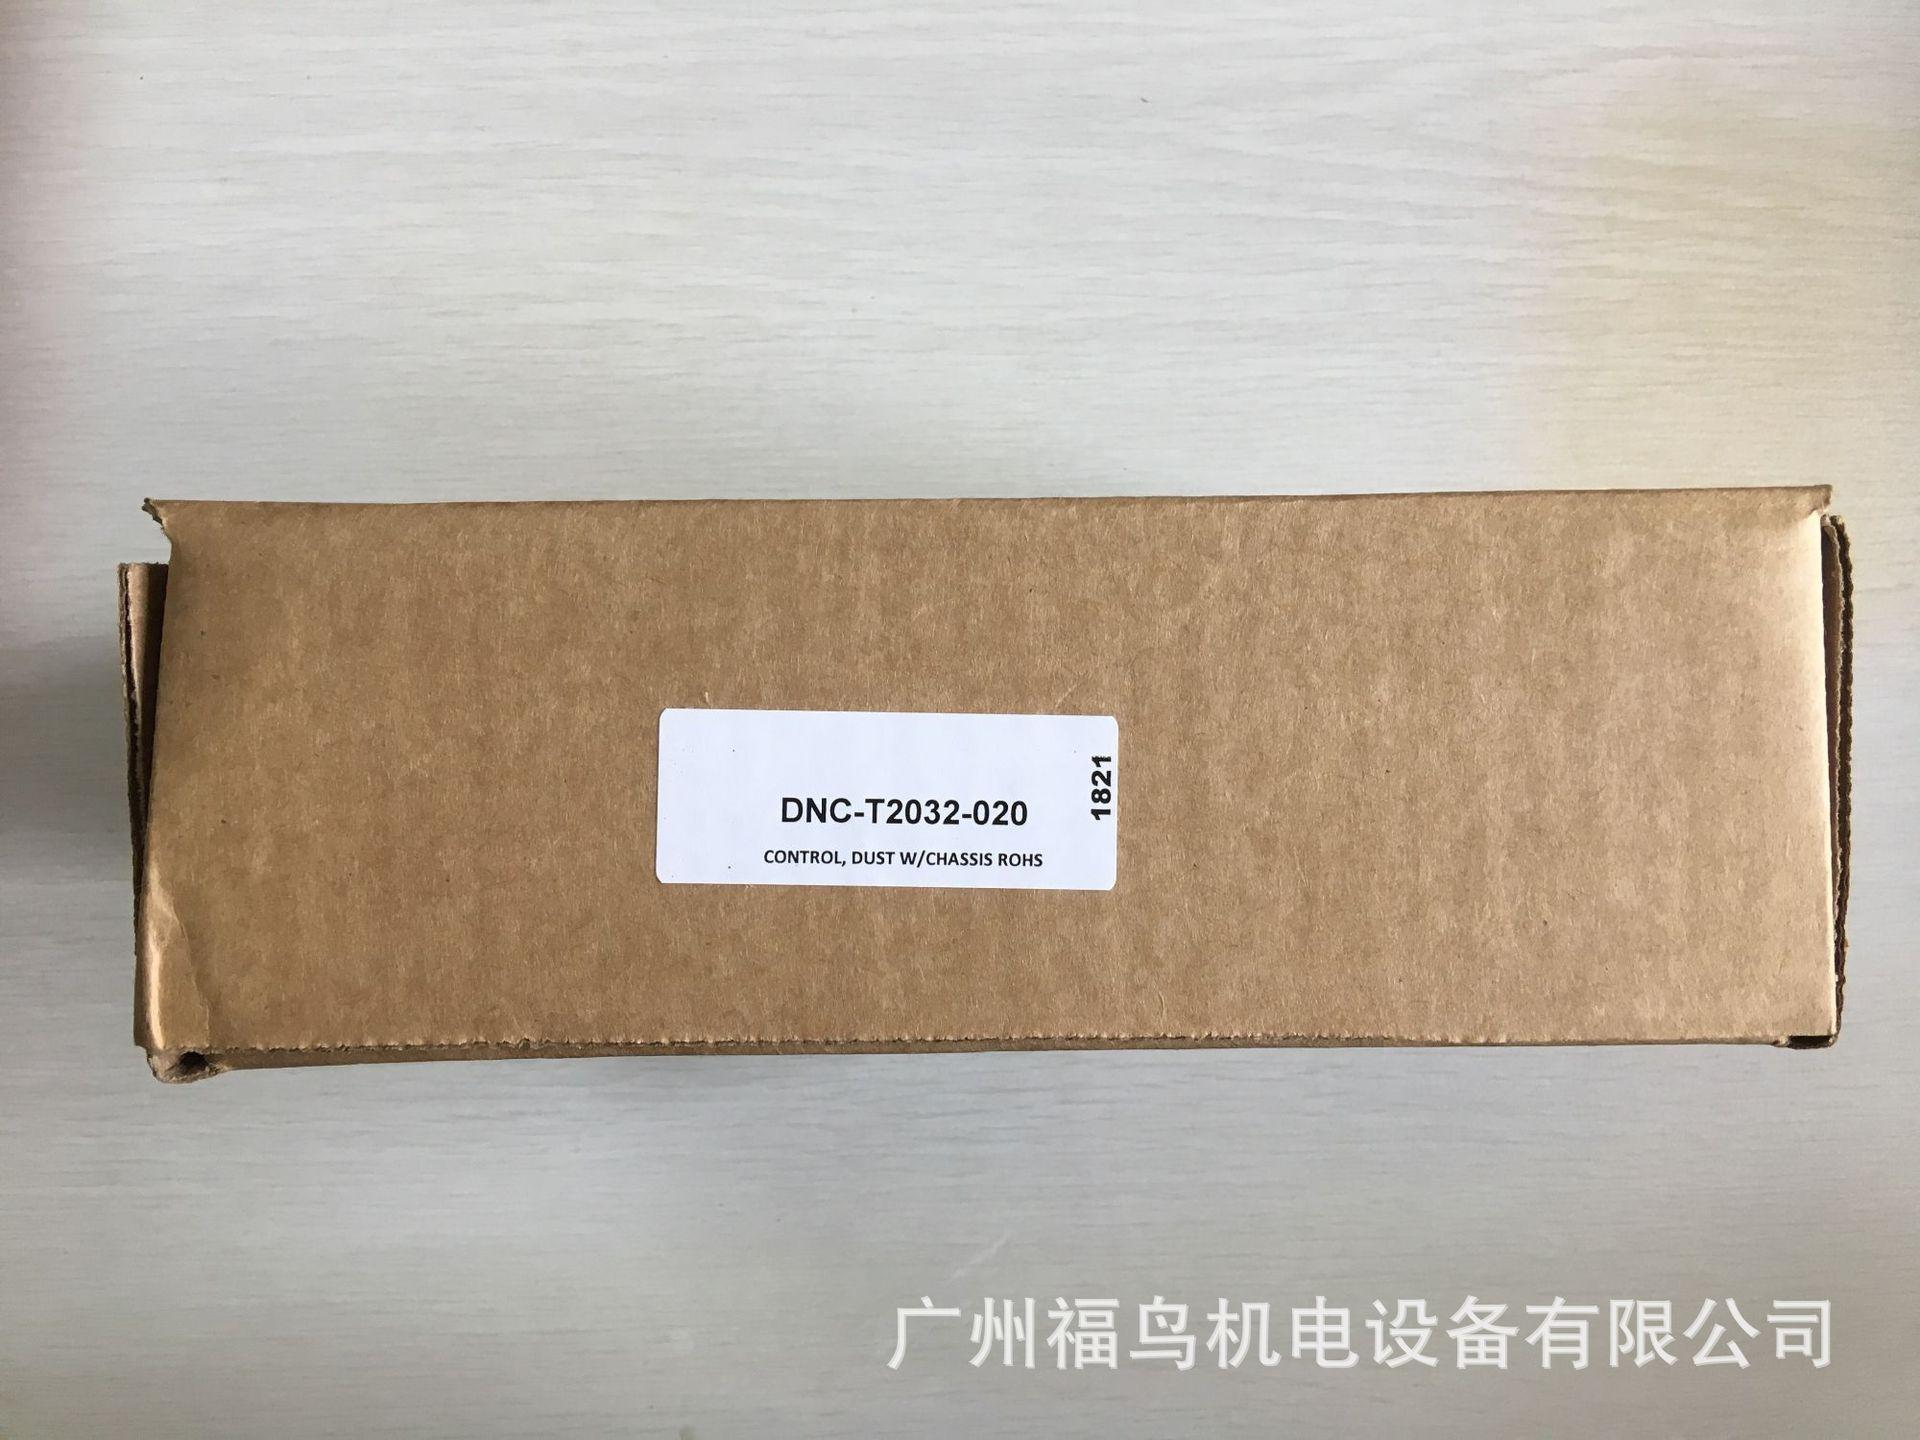 NCC脉冲除尘控制器  时序控制板, 线路板, 型号: DNC-T2032-020